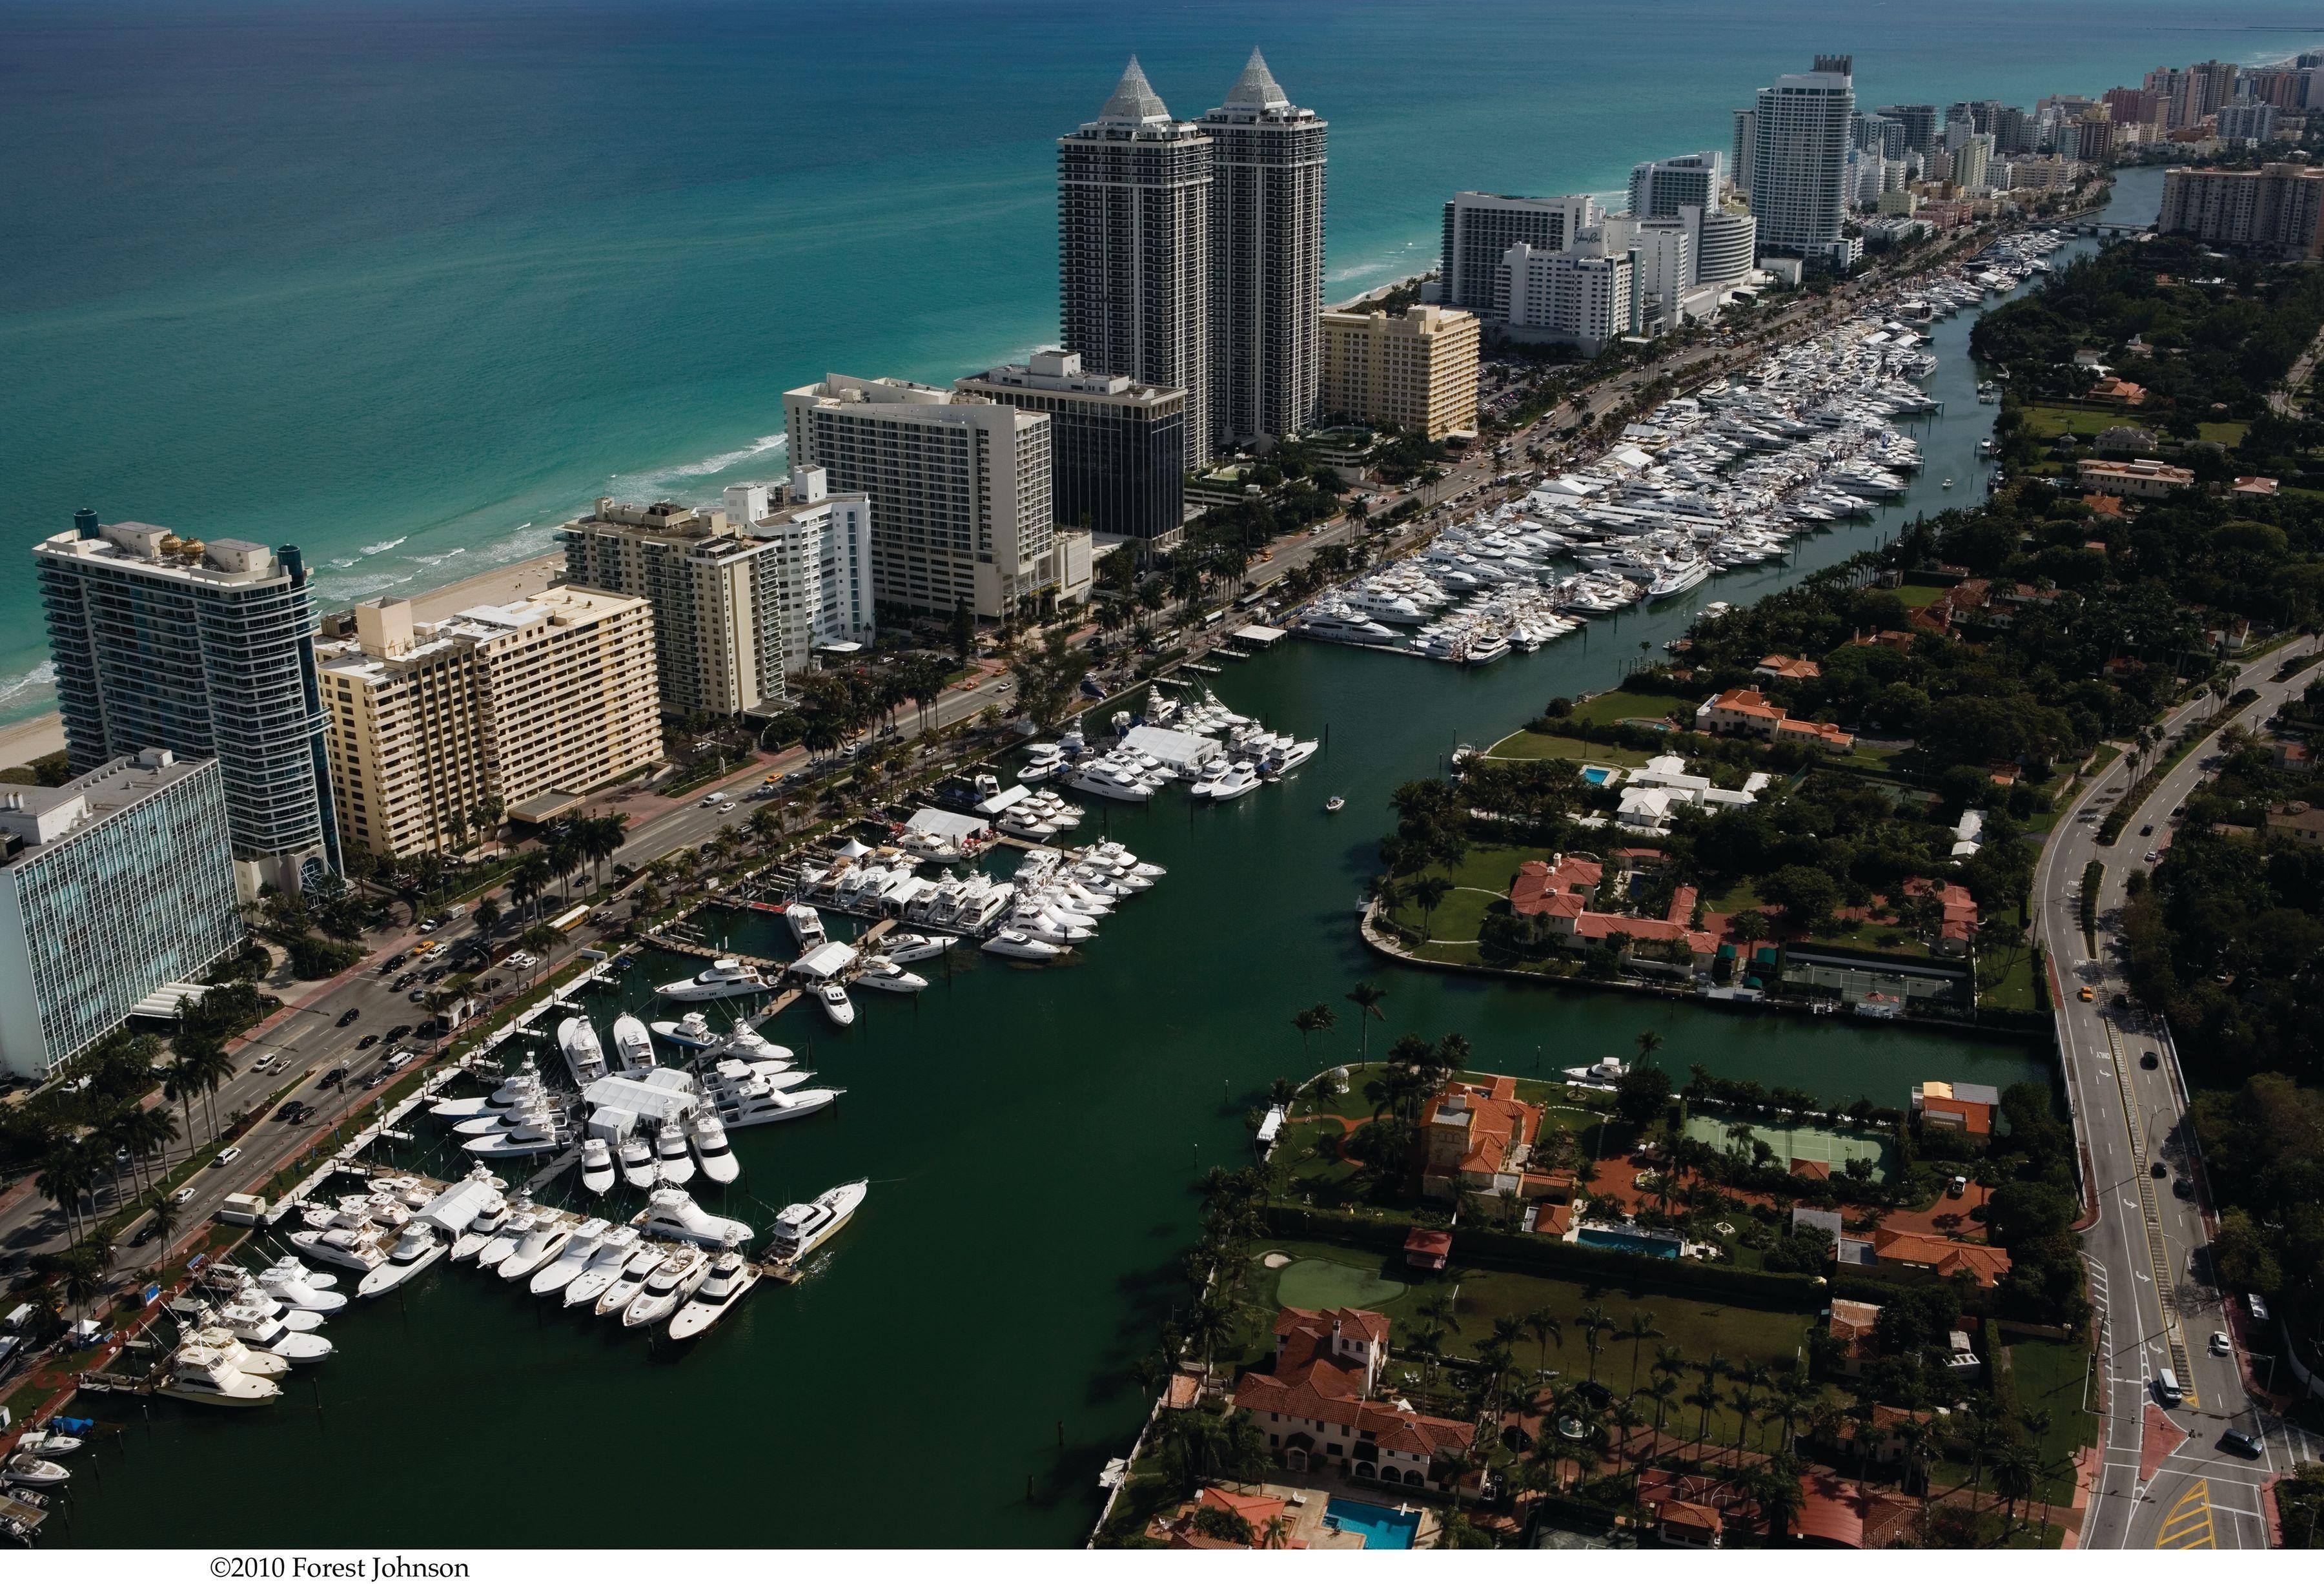 Wallpaper yacht brokerage show in miami beach miami wallpapers 3600x2453